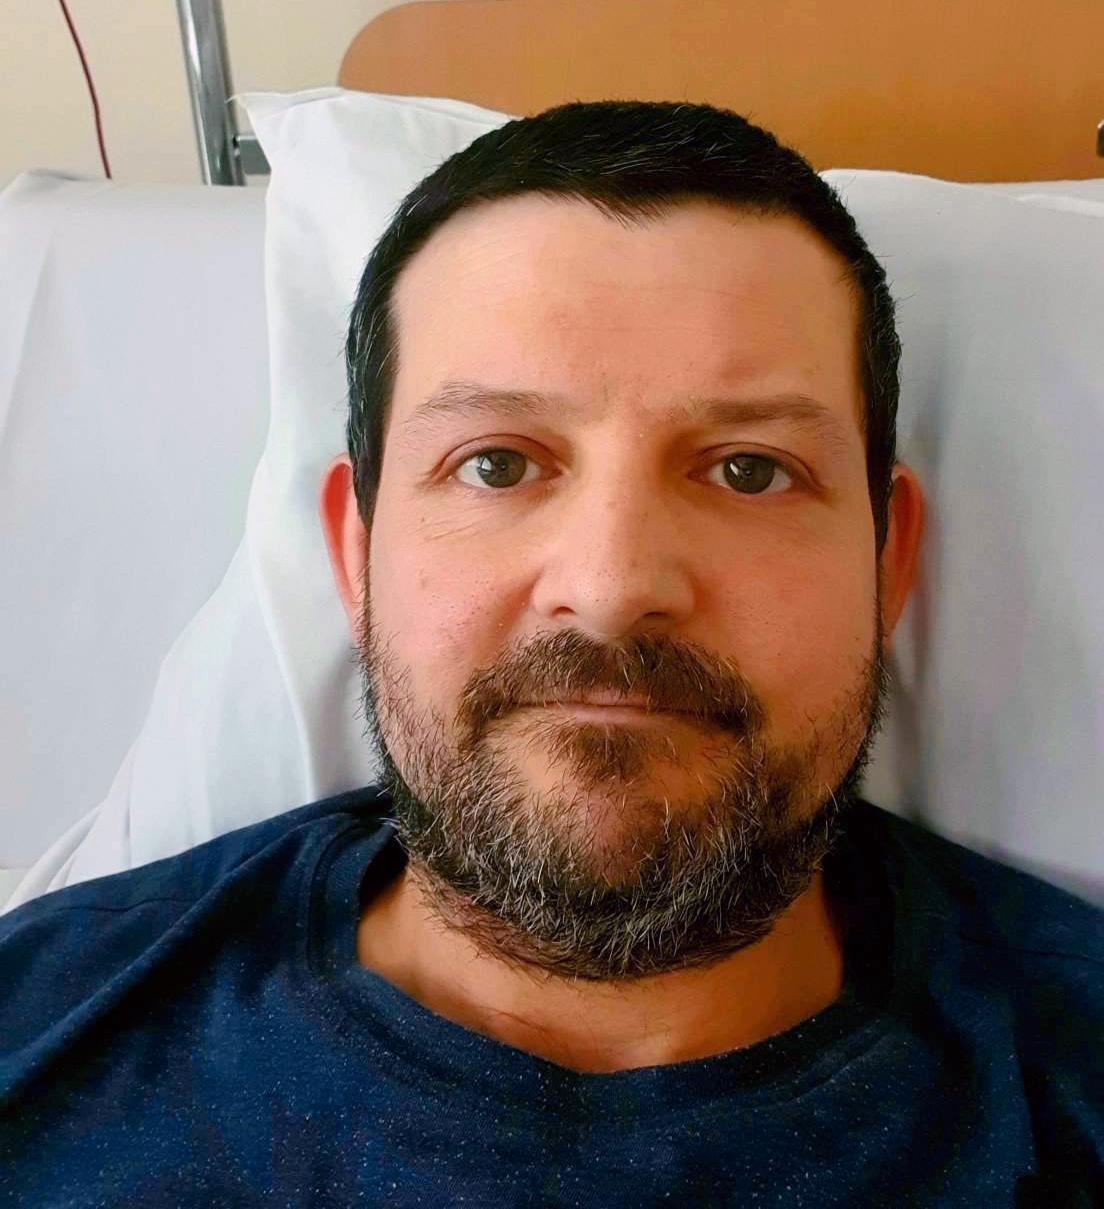 Krisztian Balogh fick flera blodproppar i magen.